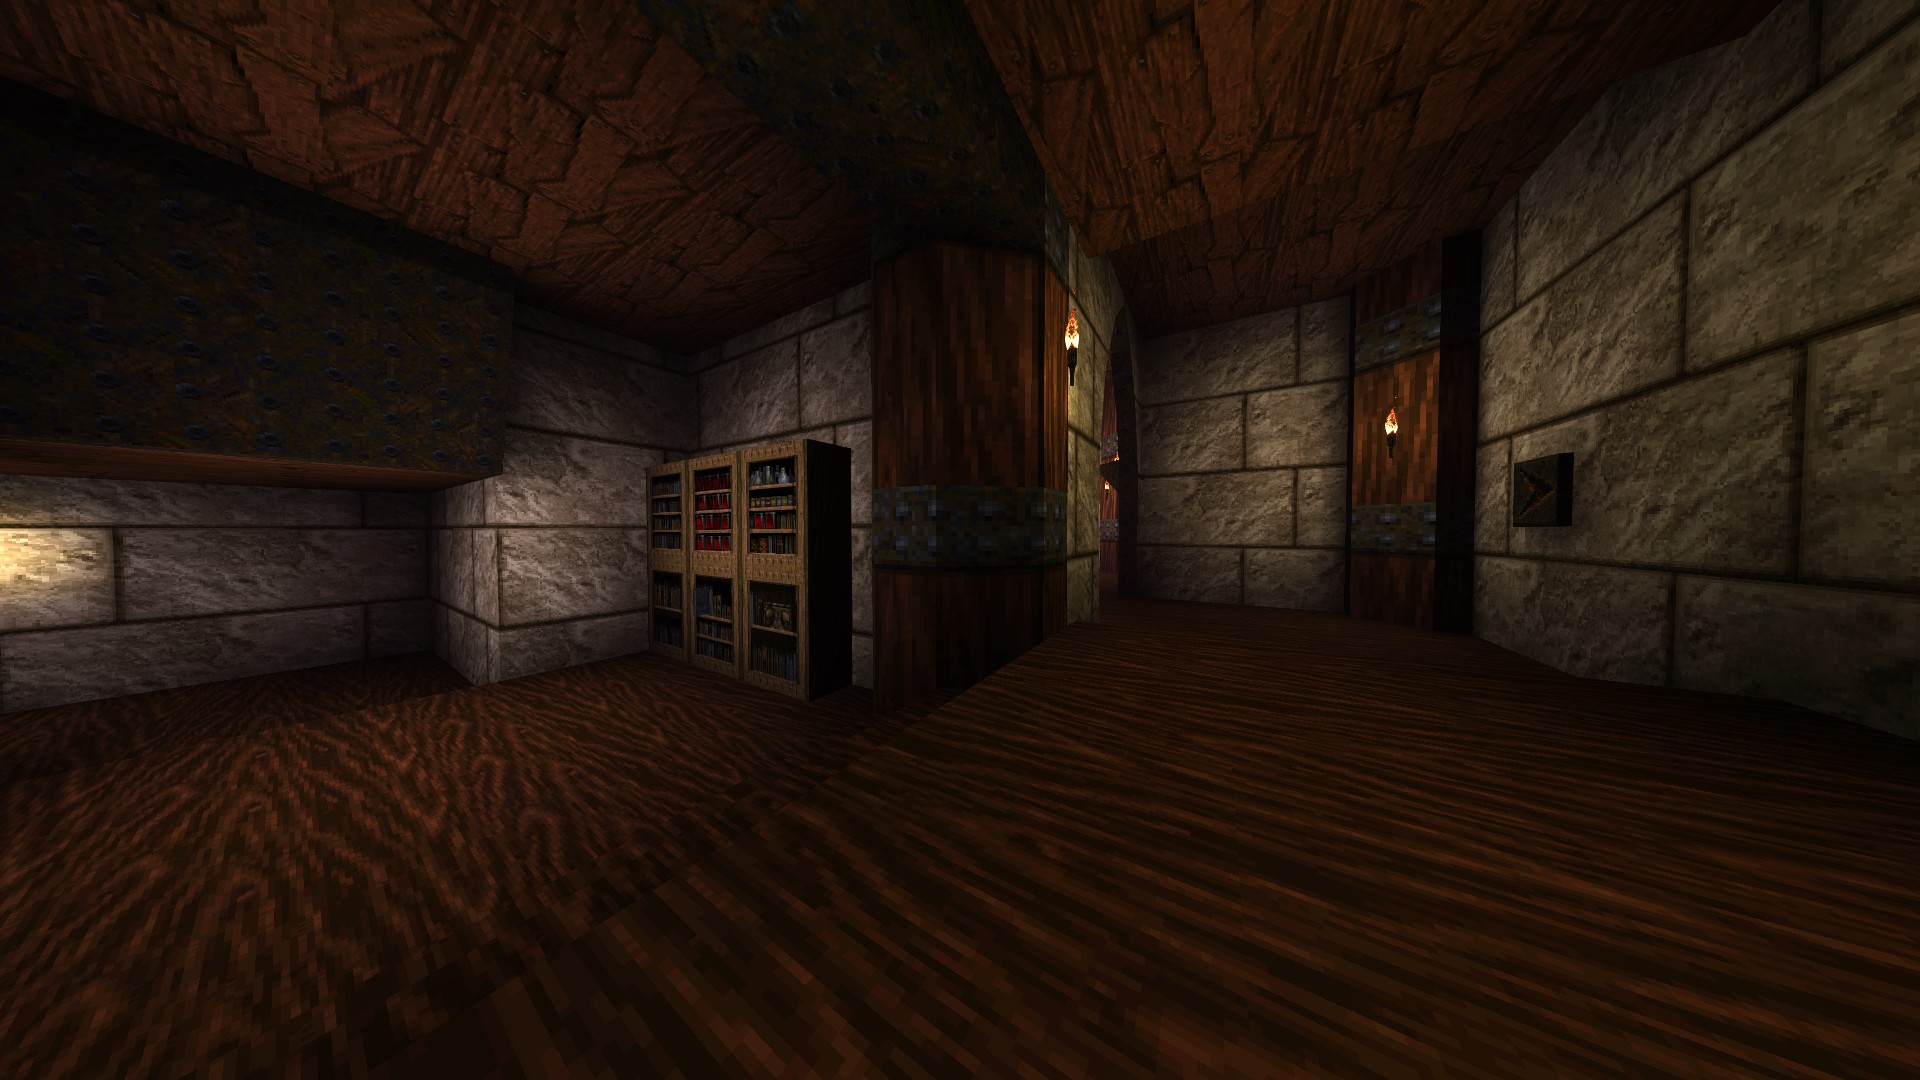 Quake - Locations of All Secrets in Game Tips - E2: Dominion of Darkness - Part I - E3332D7